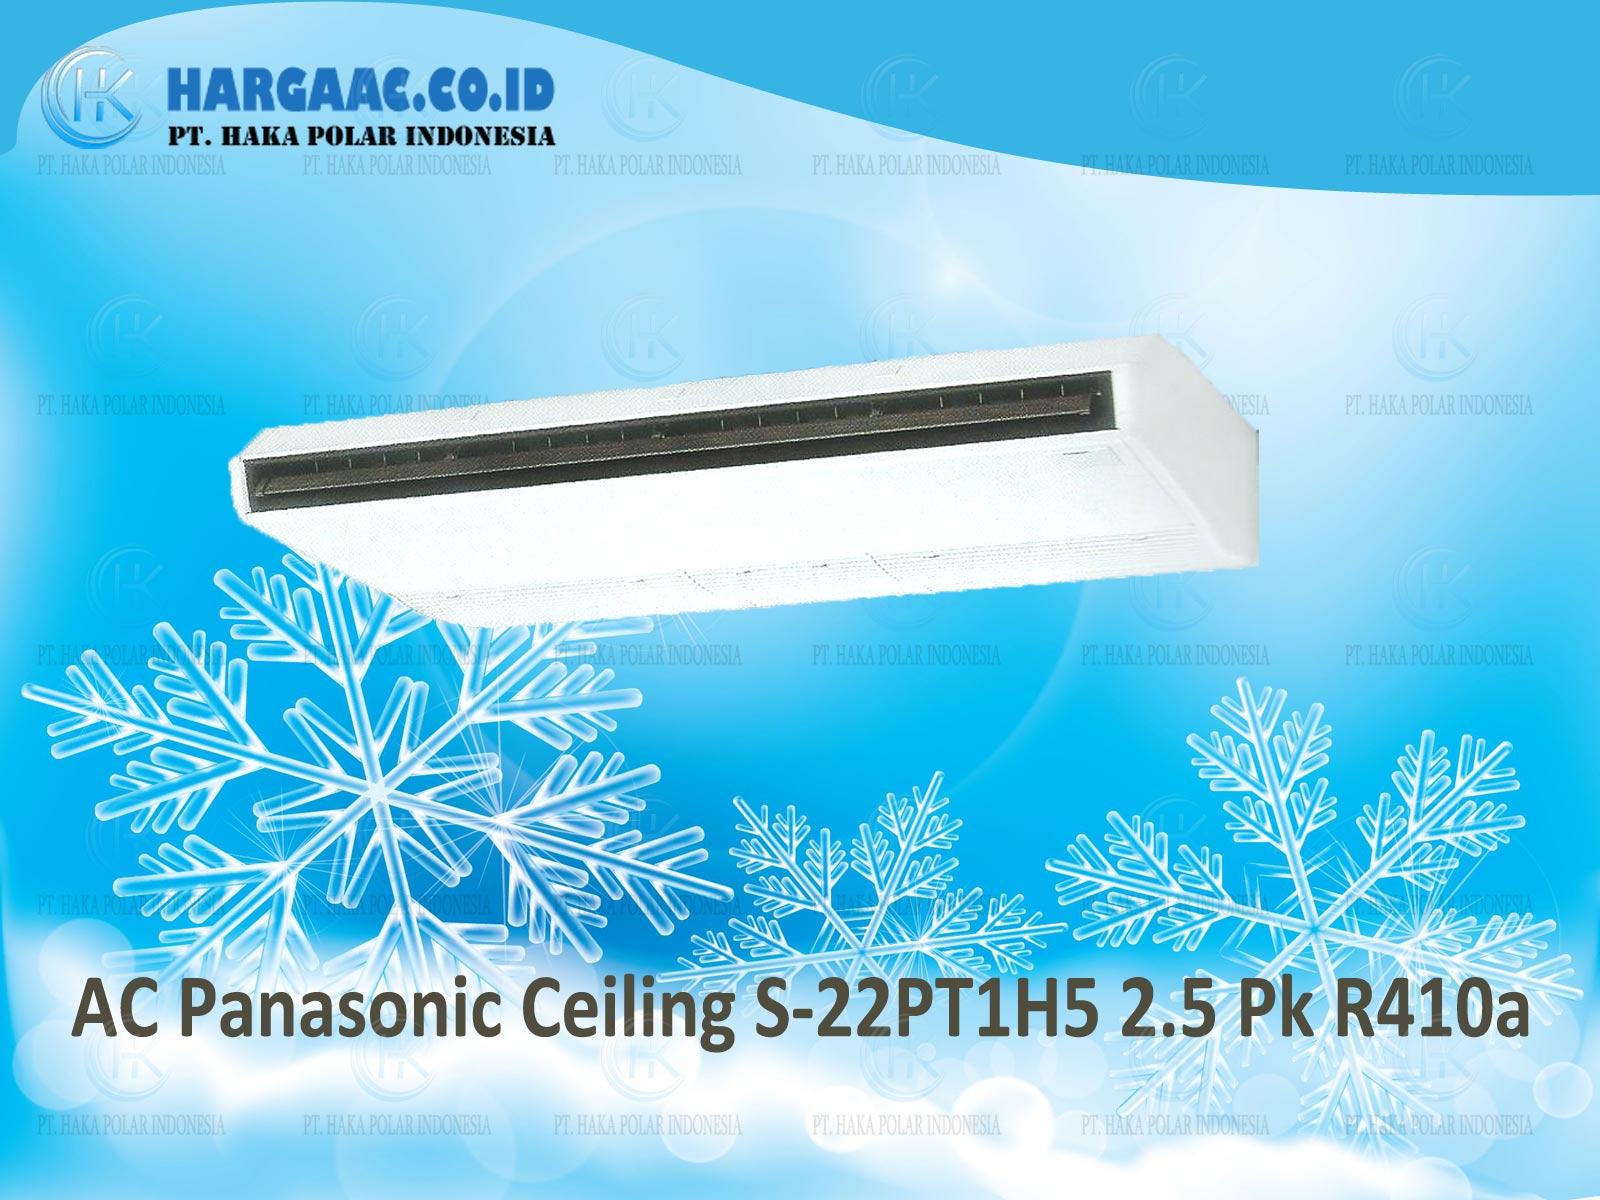 AC Panasonic Ceiling S-22PT1H5 1 Phase 2.5 PK R410a